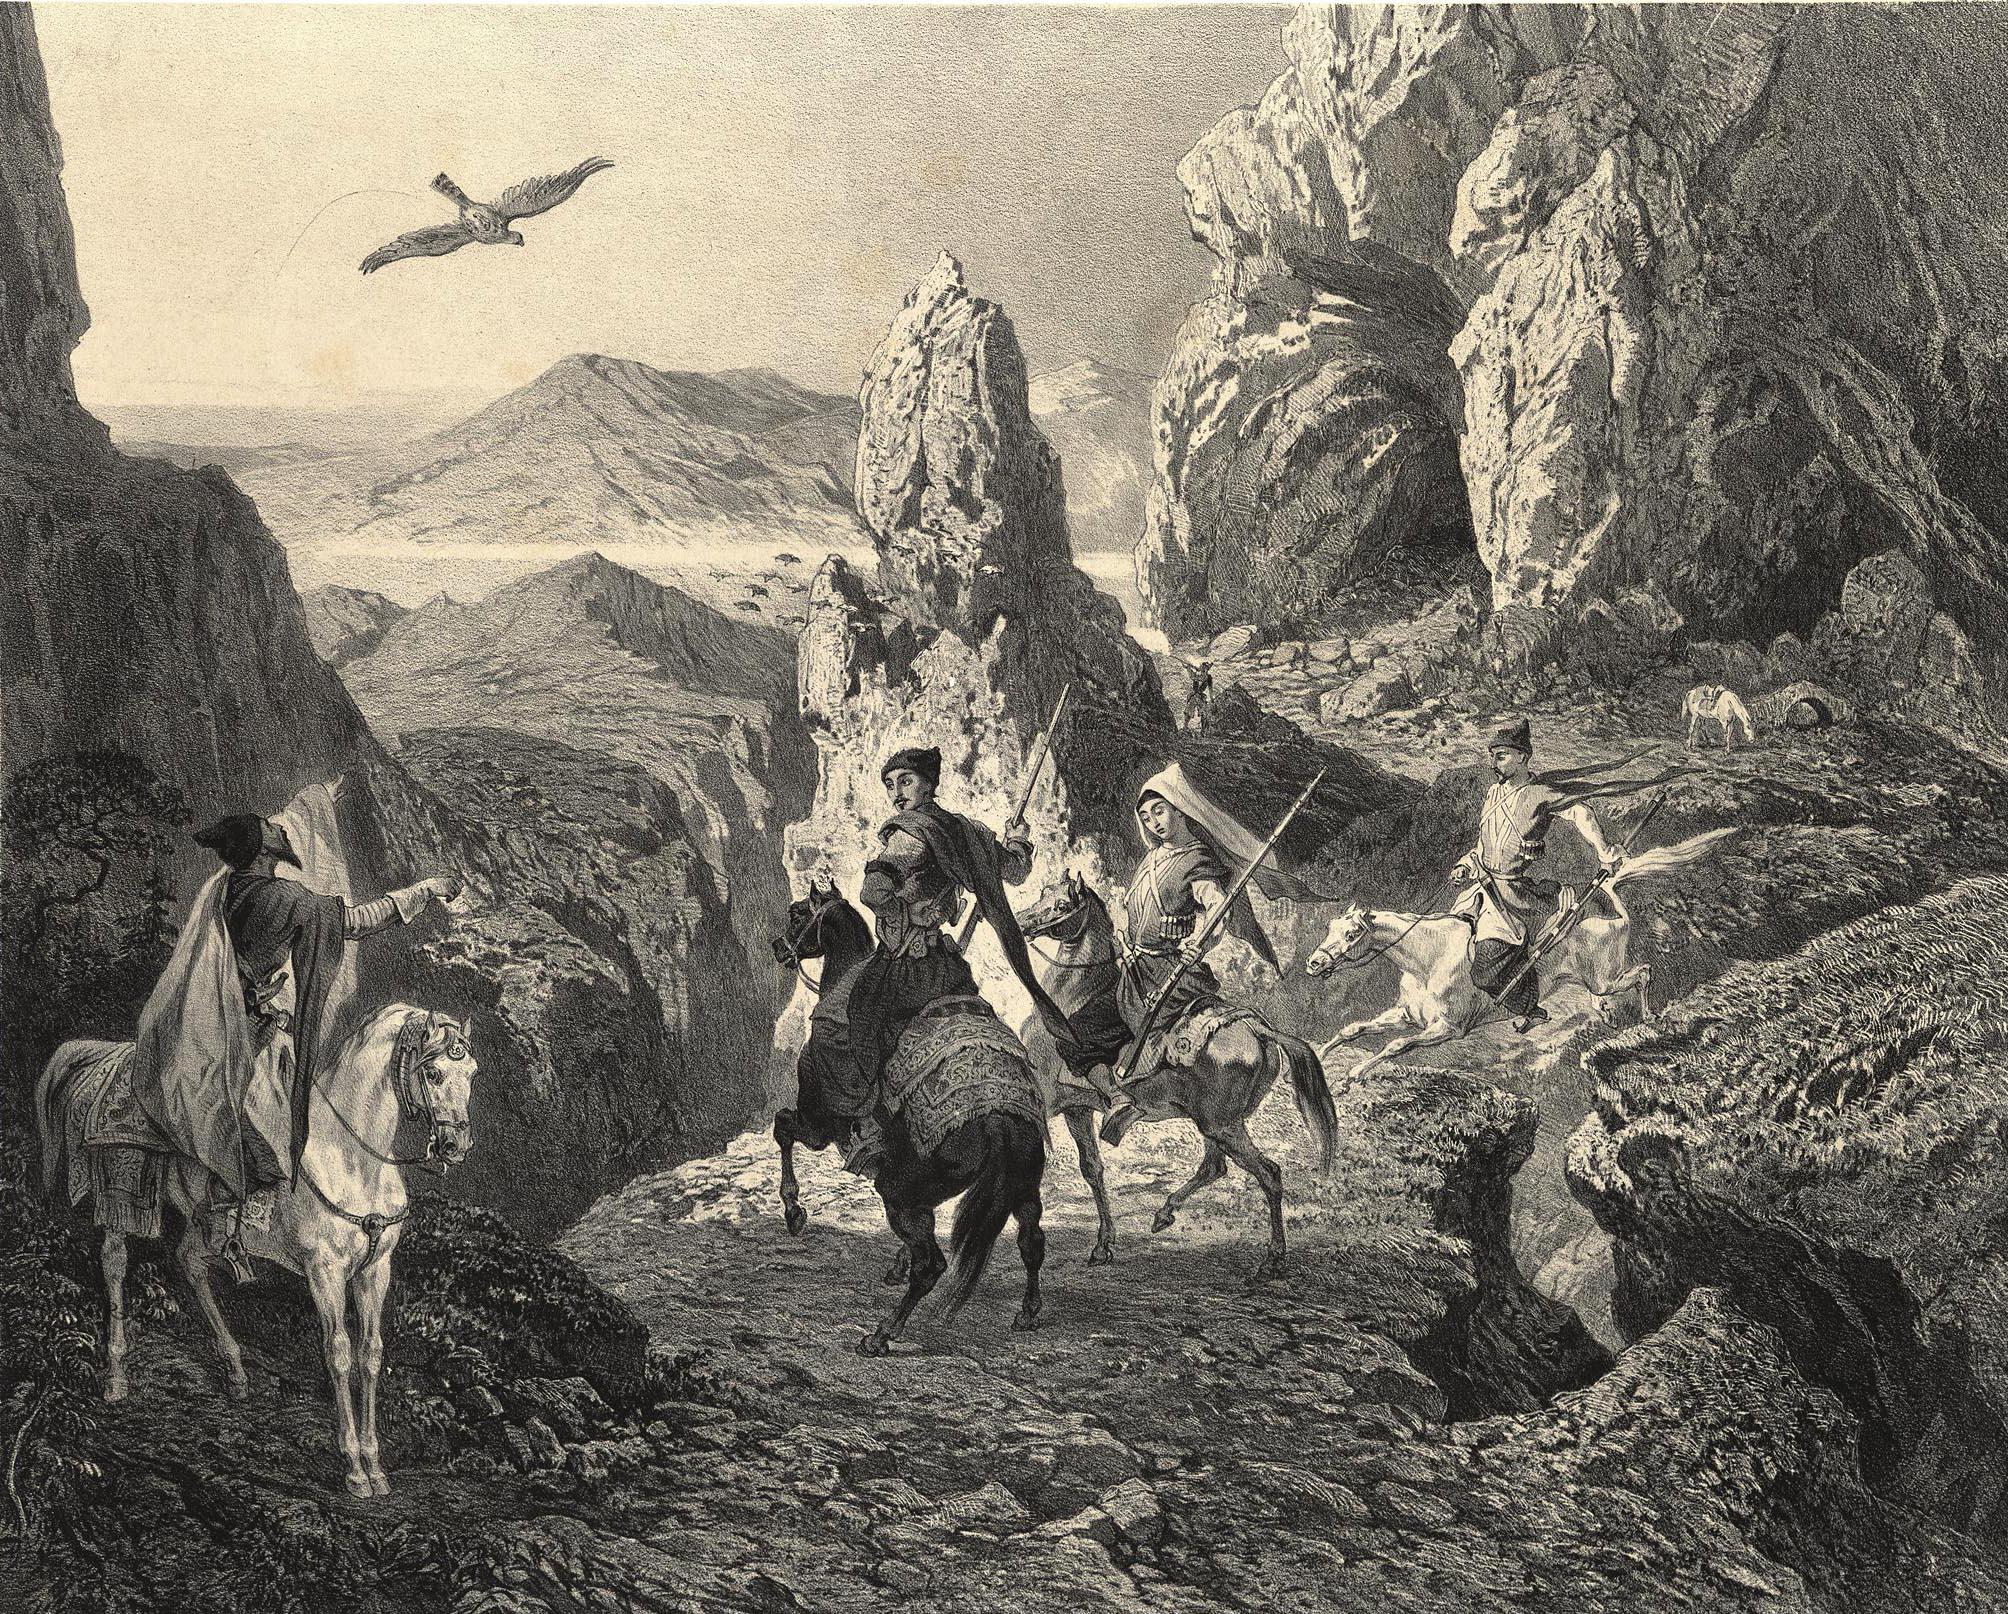 20. Armenie. Chasse au faucon, environs d'Erivan. / Армения. Соколиная охота в окресностях Эривани